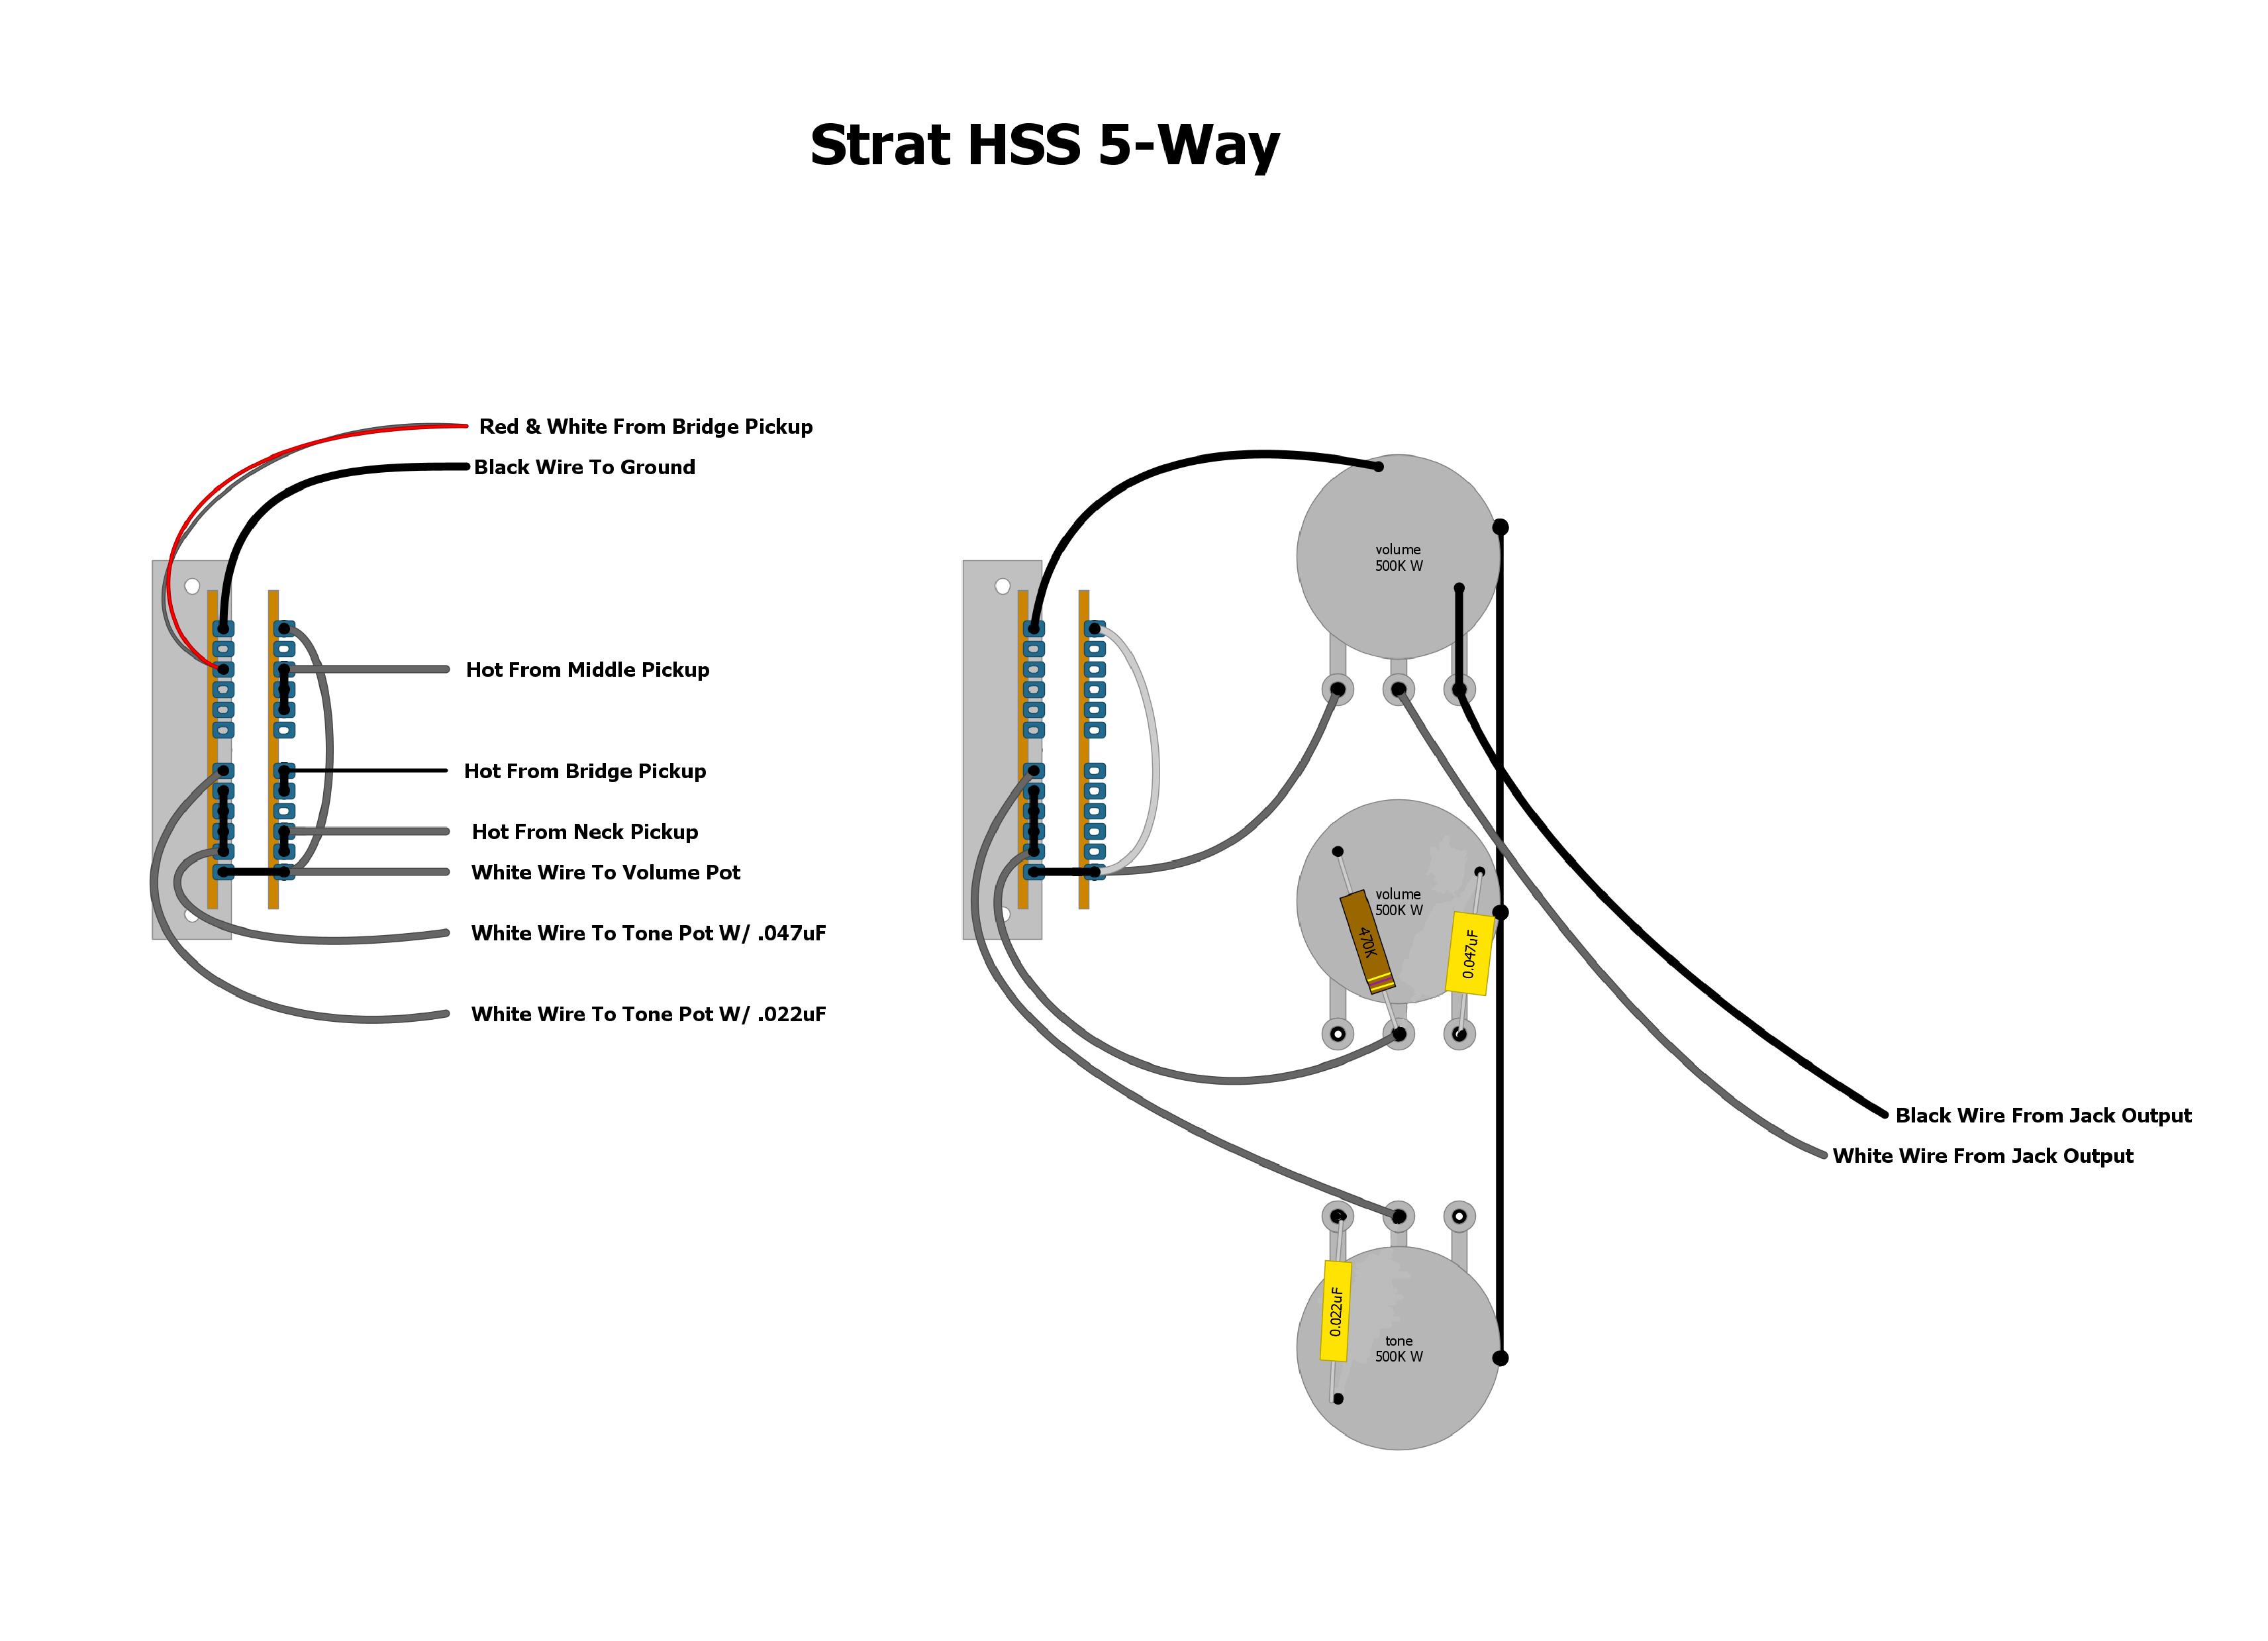 stratocaster custom shop texas special wiring diagram vm 7277  fender strat wiring diagram likewise strat hss guitar  fender strat wiring diagram likewise